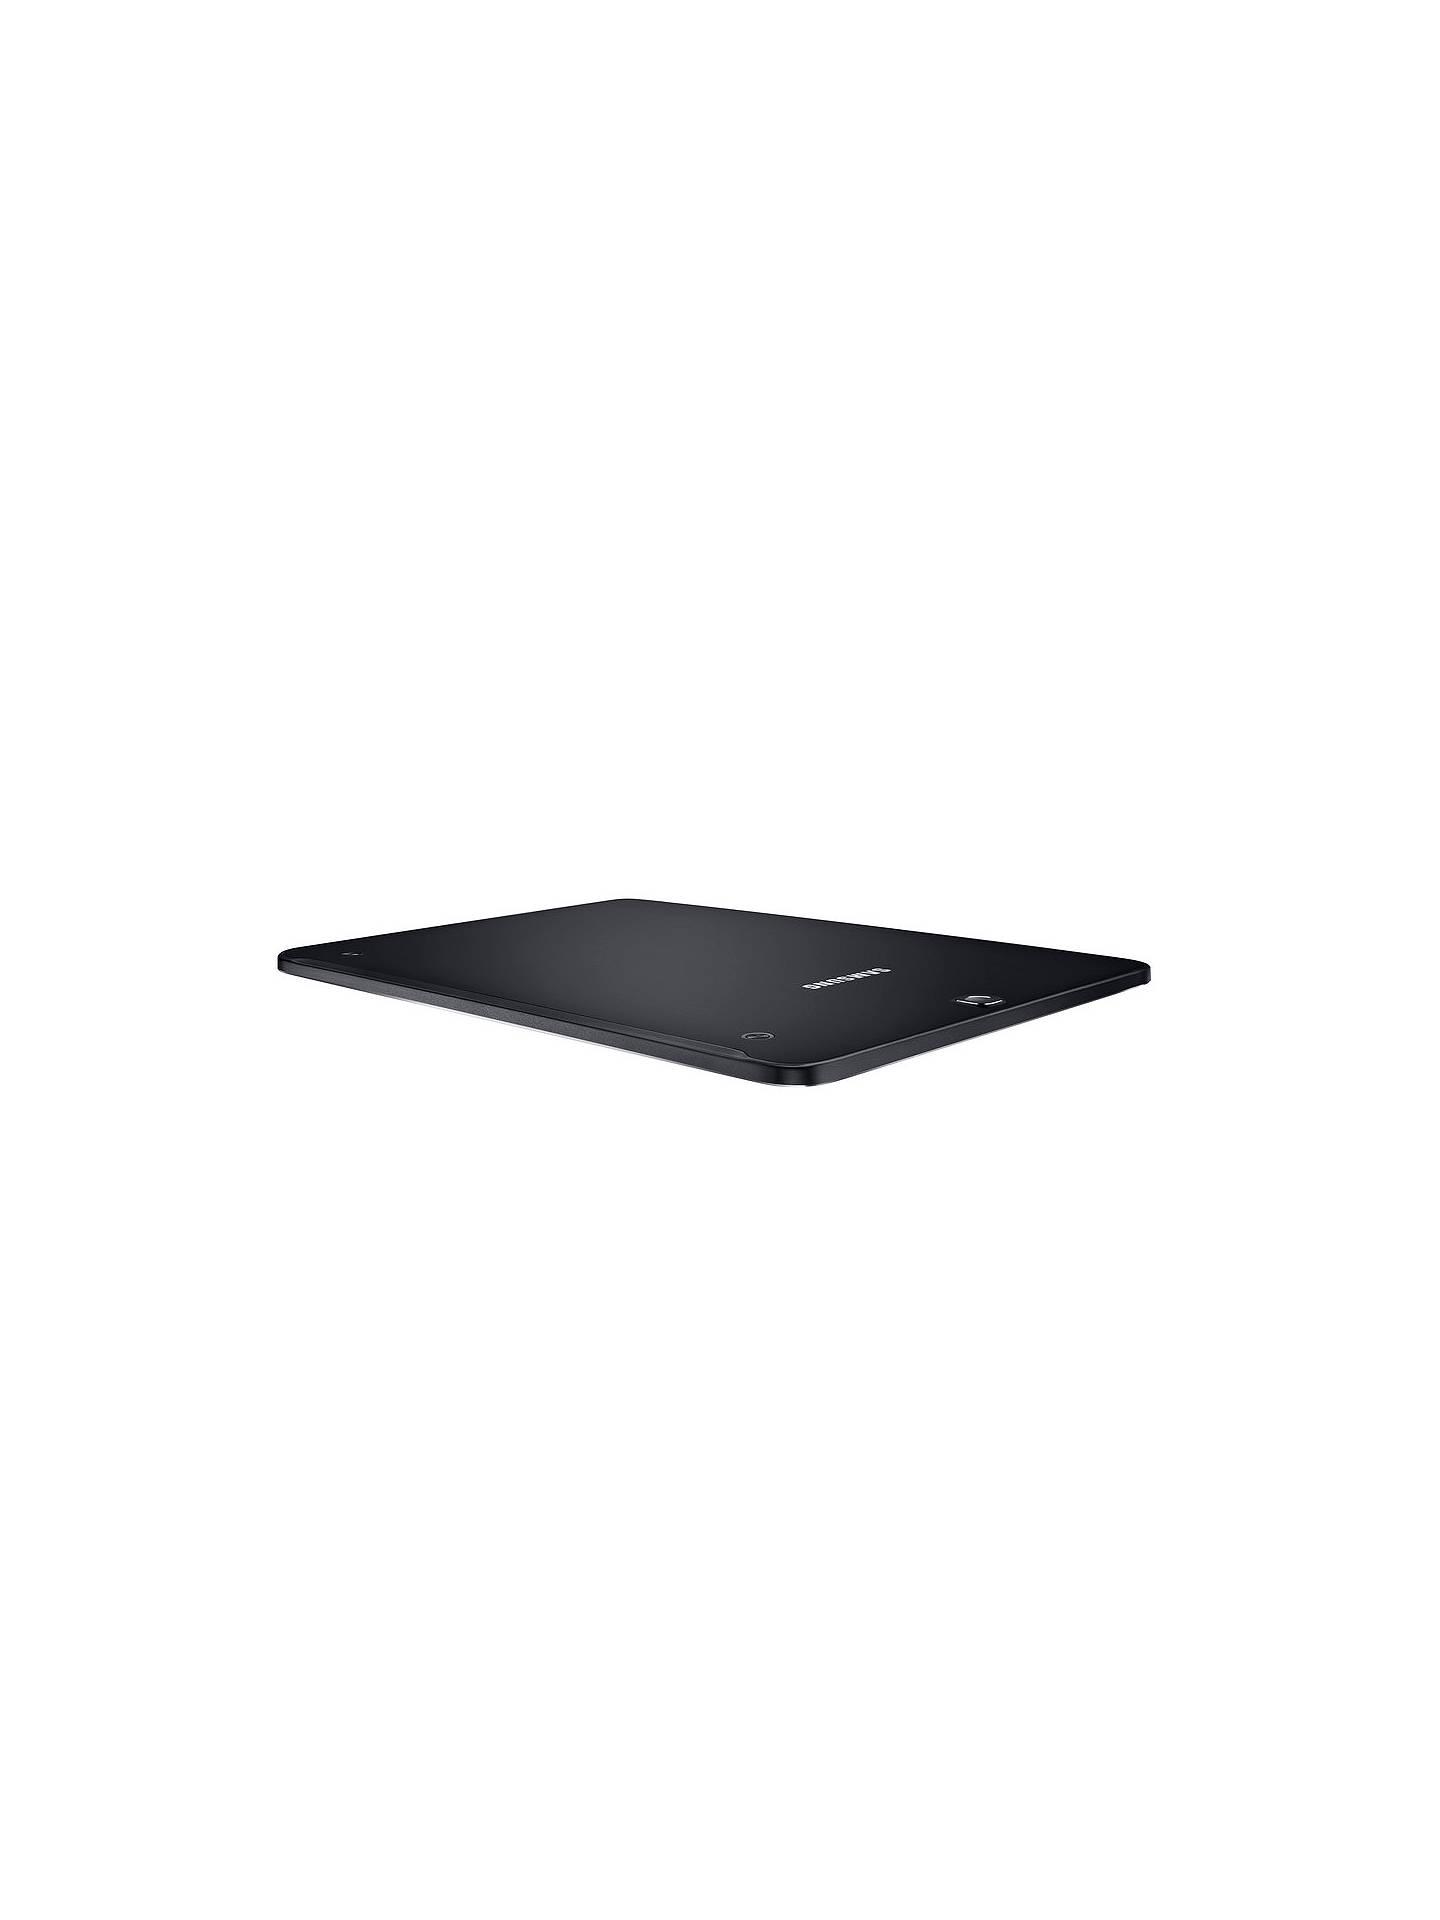 Samsung Galaxy Tab S2, Octa-core Exynos, Android, 9 7